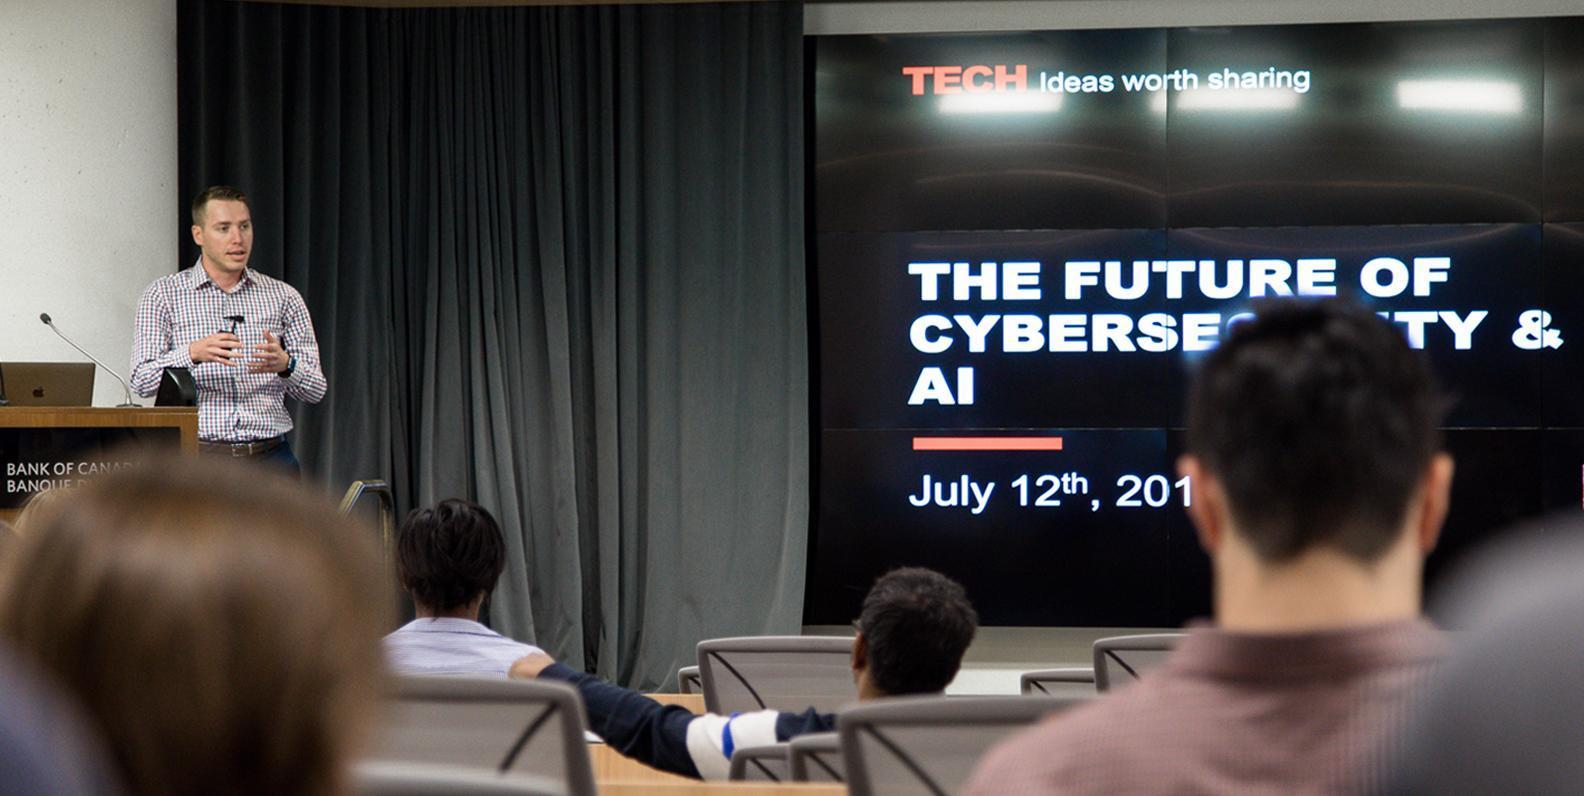 Jeff Schwartzentruber, Ph. D., de C3SA Cyber Security Audit Corporation